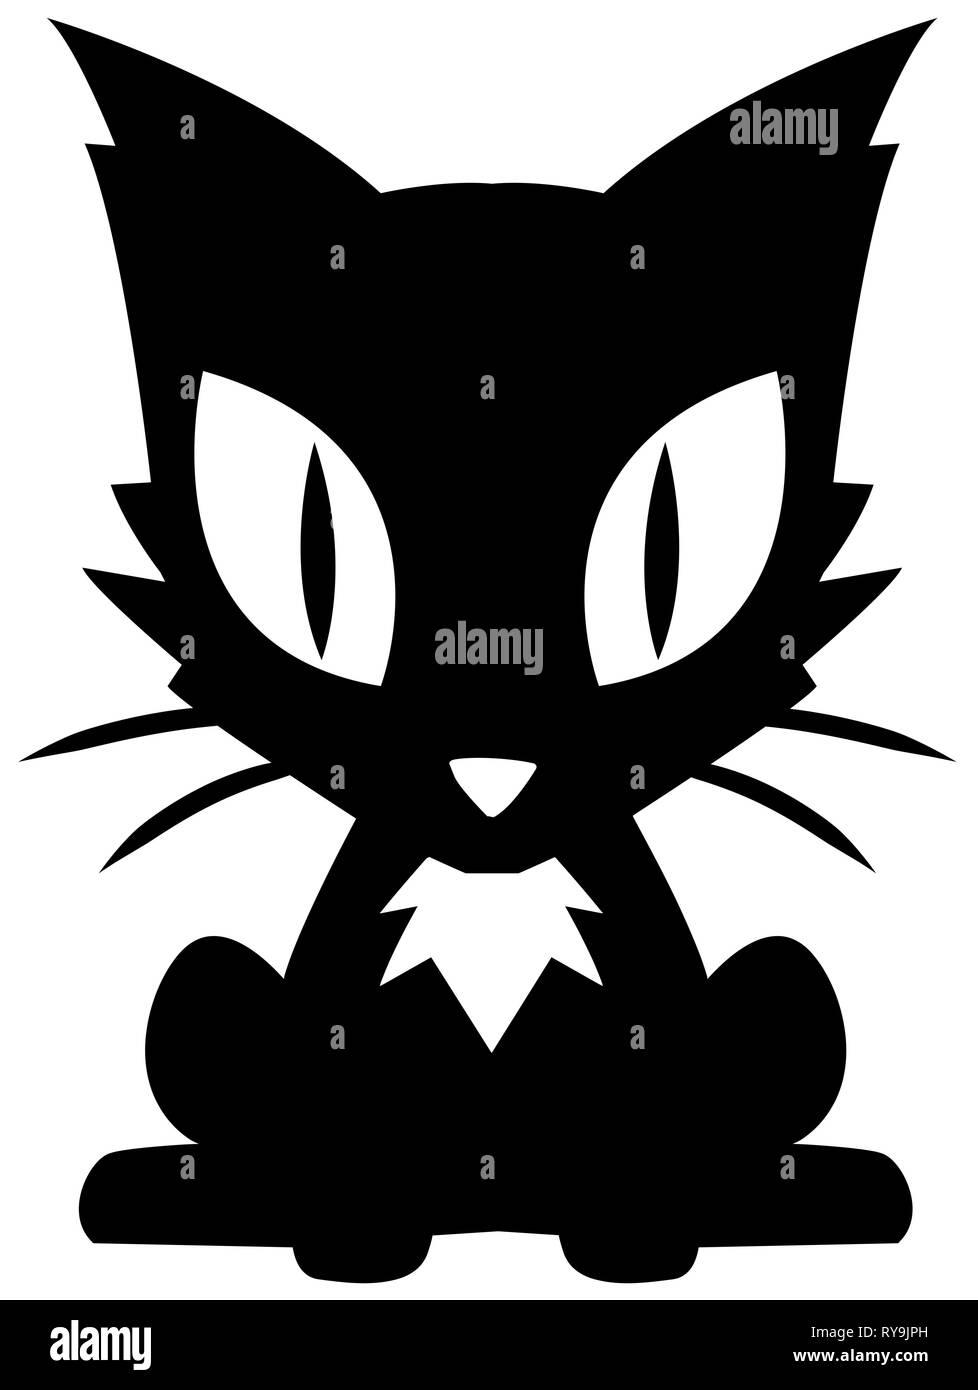 Kitten sitting stencil black, vector illustration, vertical, isolated - Stock Vector